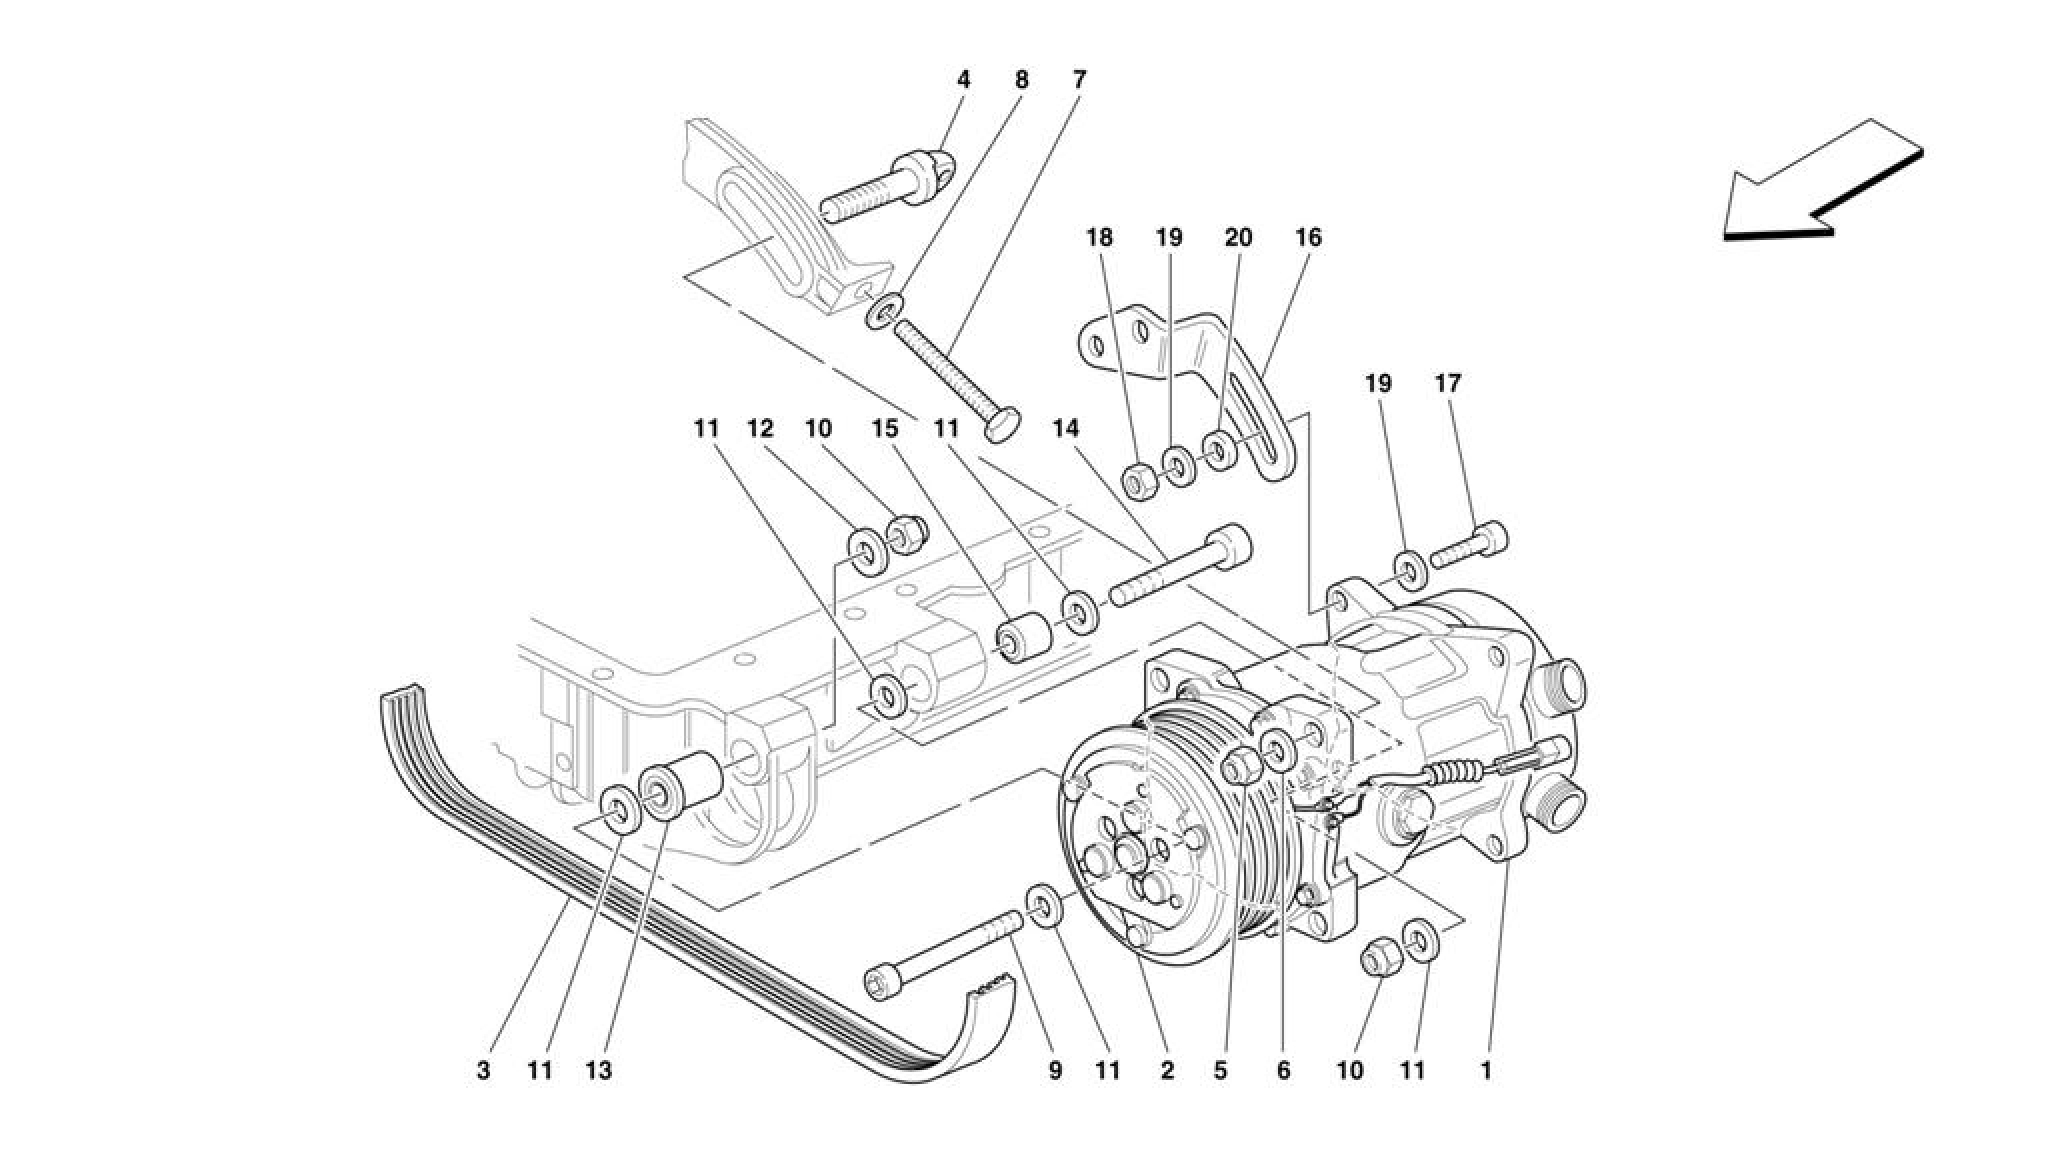 Ferrari F355 M5.2 (1996+) AIR CONDITIONING COMPRESSOR